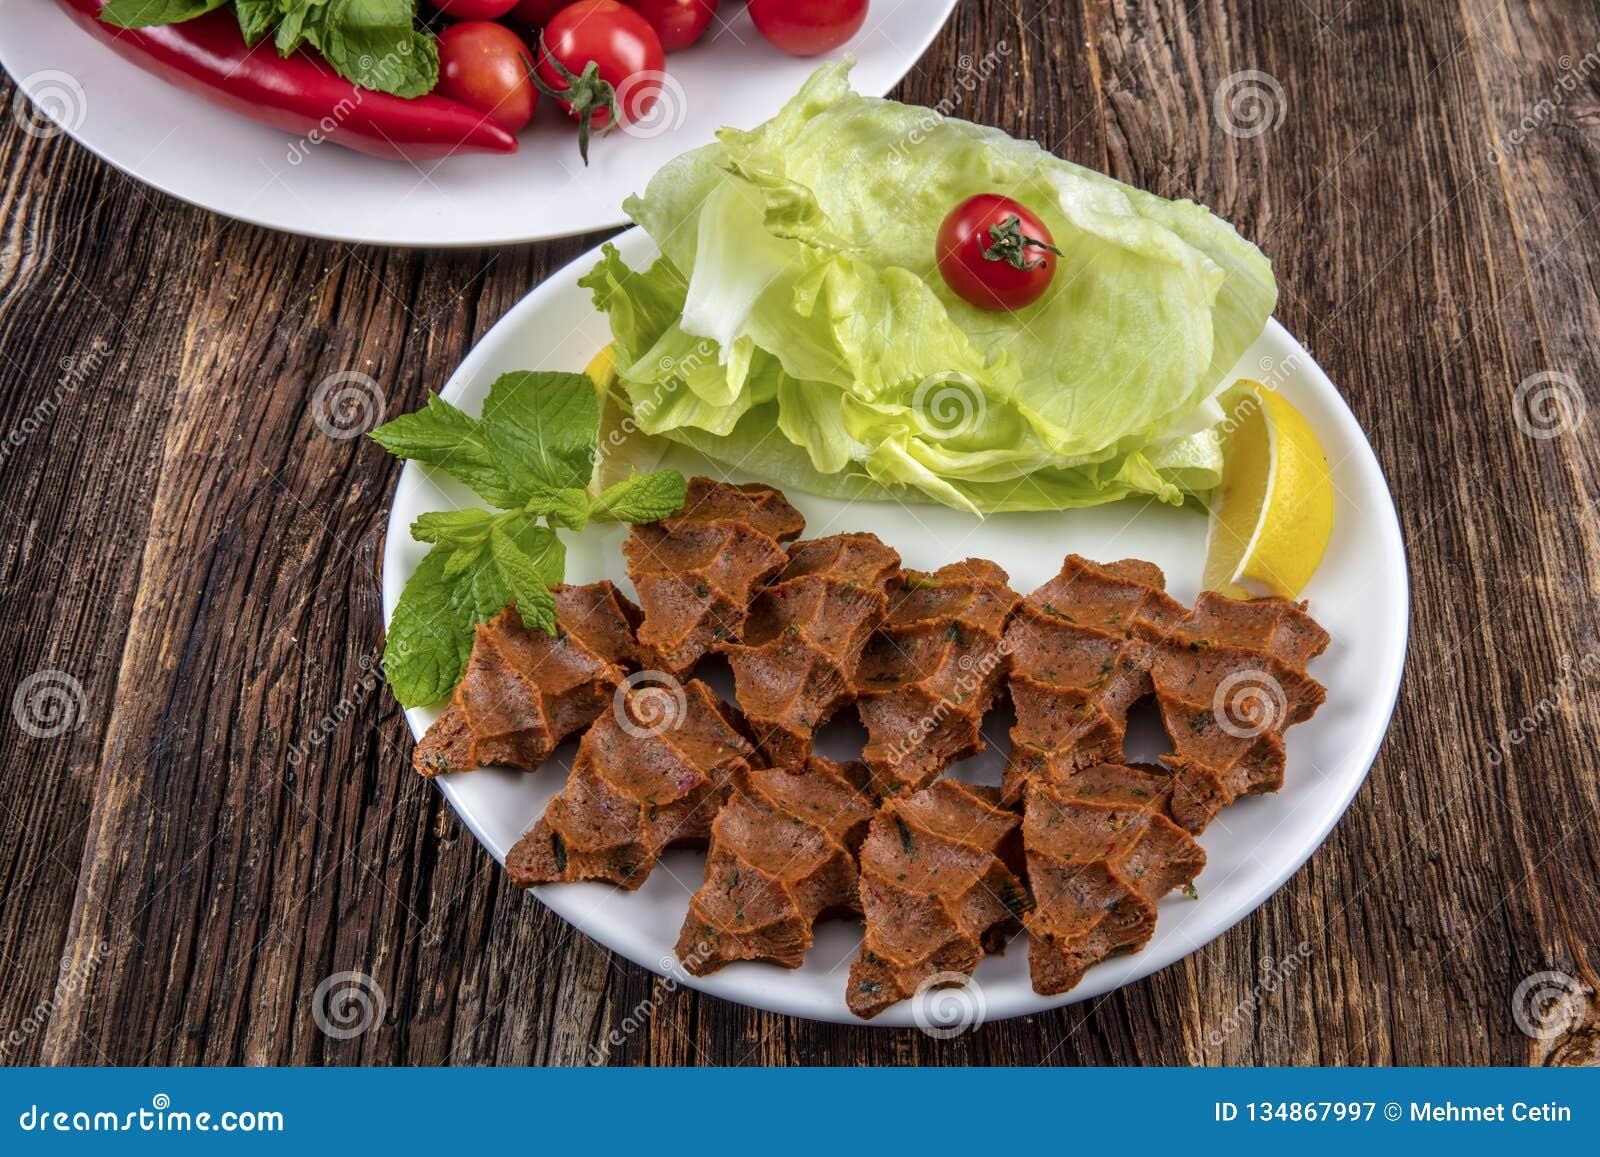 Cig kofte, ένα ακατέργαστο πιάτο κρέατος στις τουρκικές και αρμενικές κουζίνες Τουρκικά μέσα cig